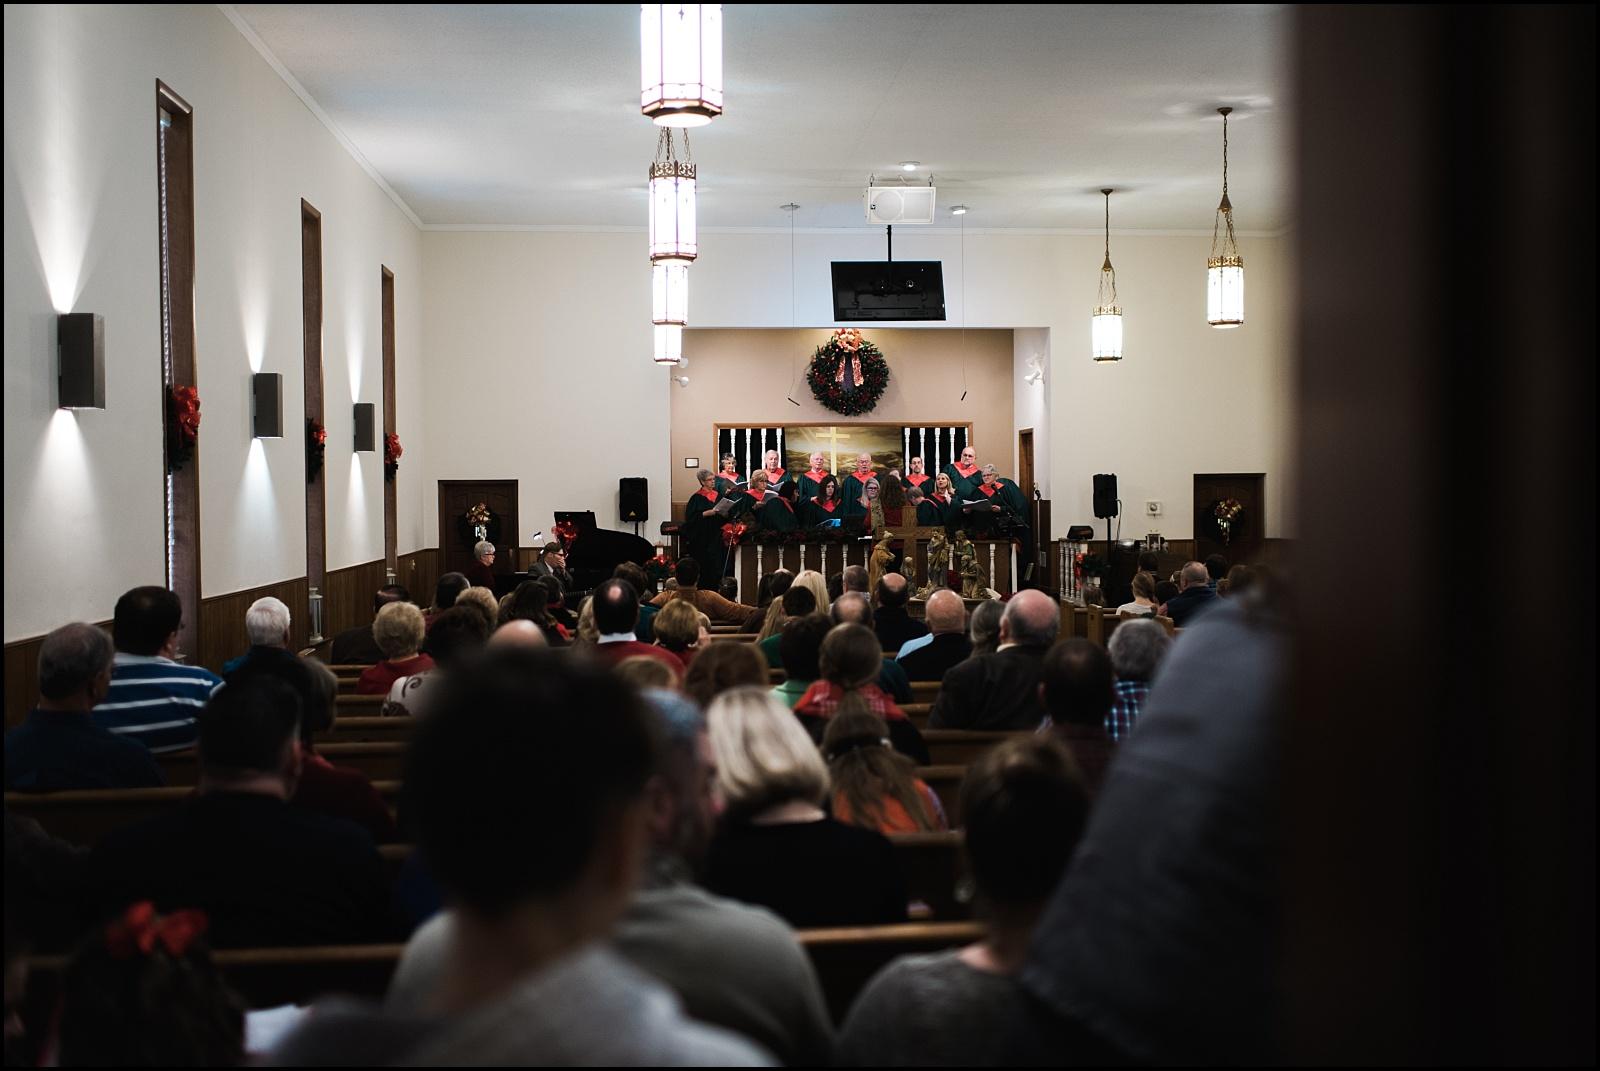 Church service before wedding